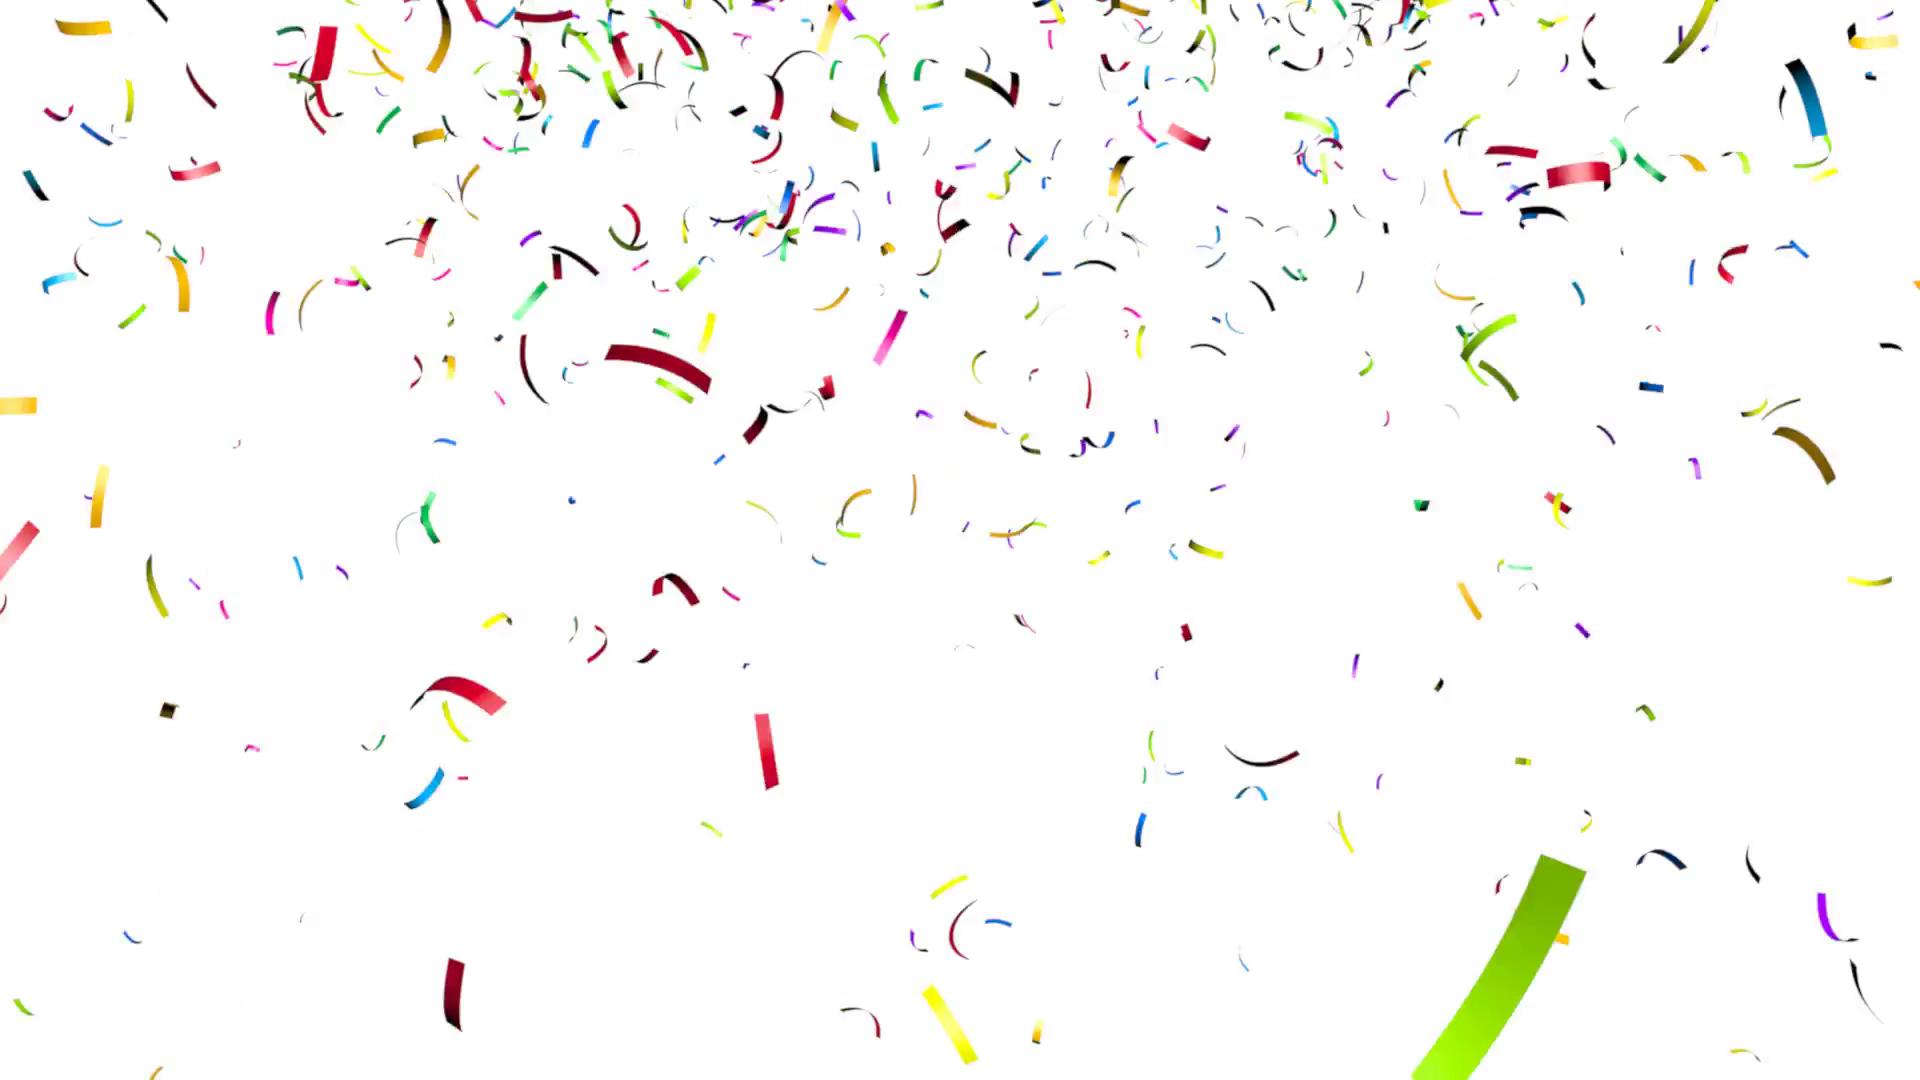 Confetes em png 1 » PNG Image.